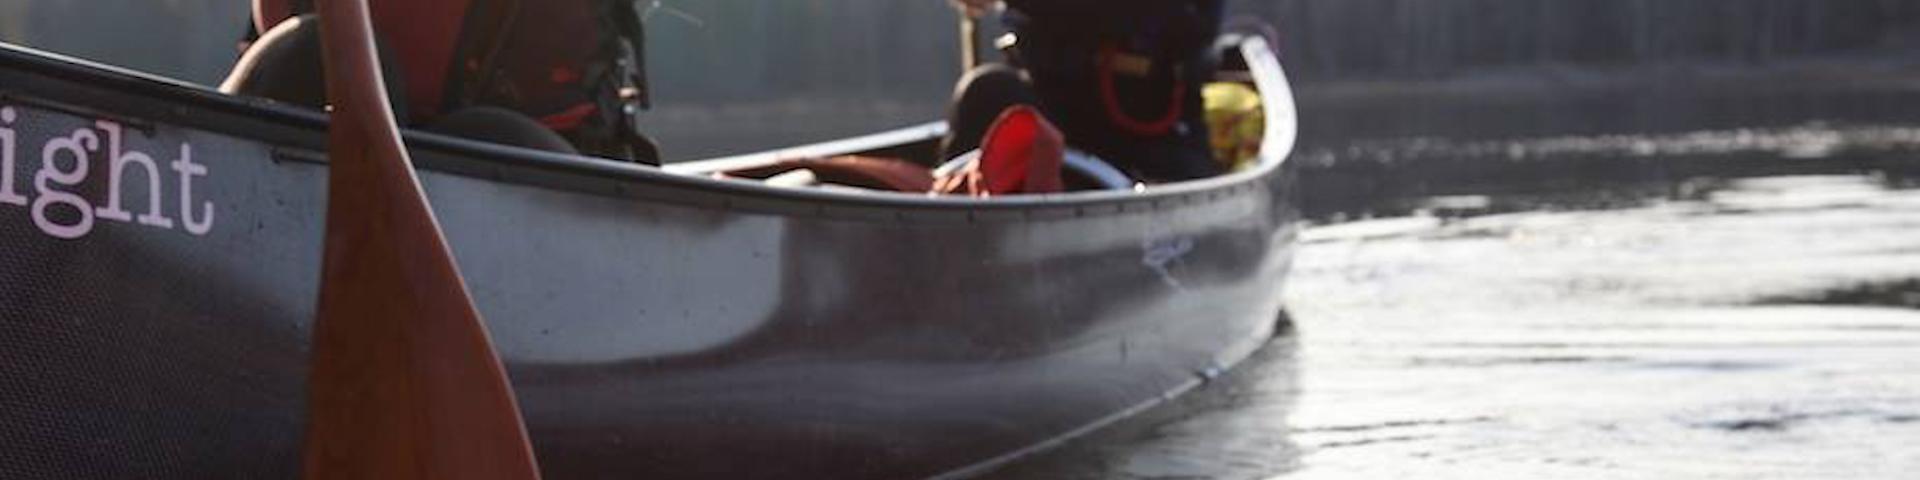 Canoe Paddles: Creek Stick by Echo Paddles - Image 3048